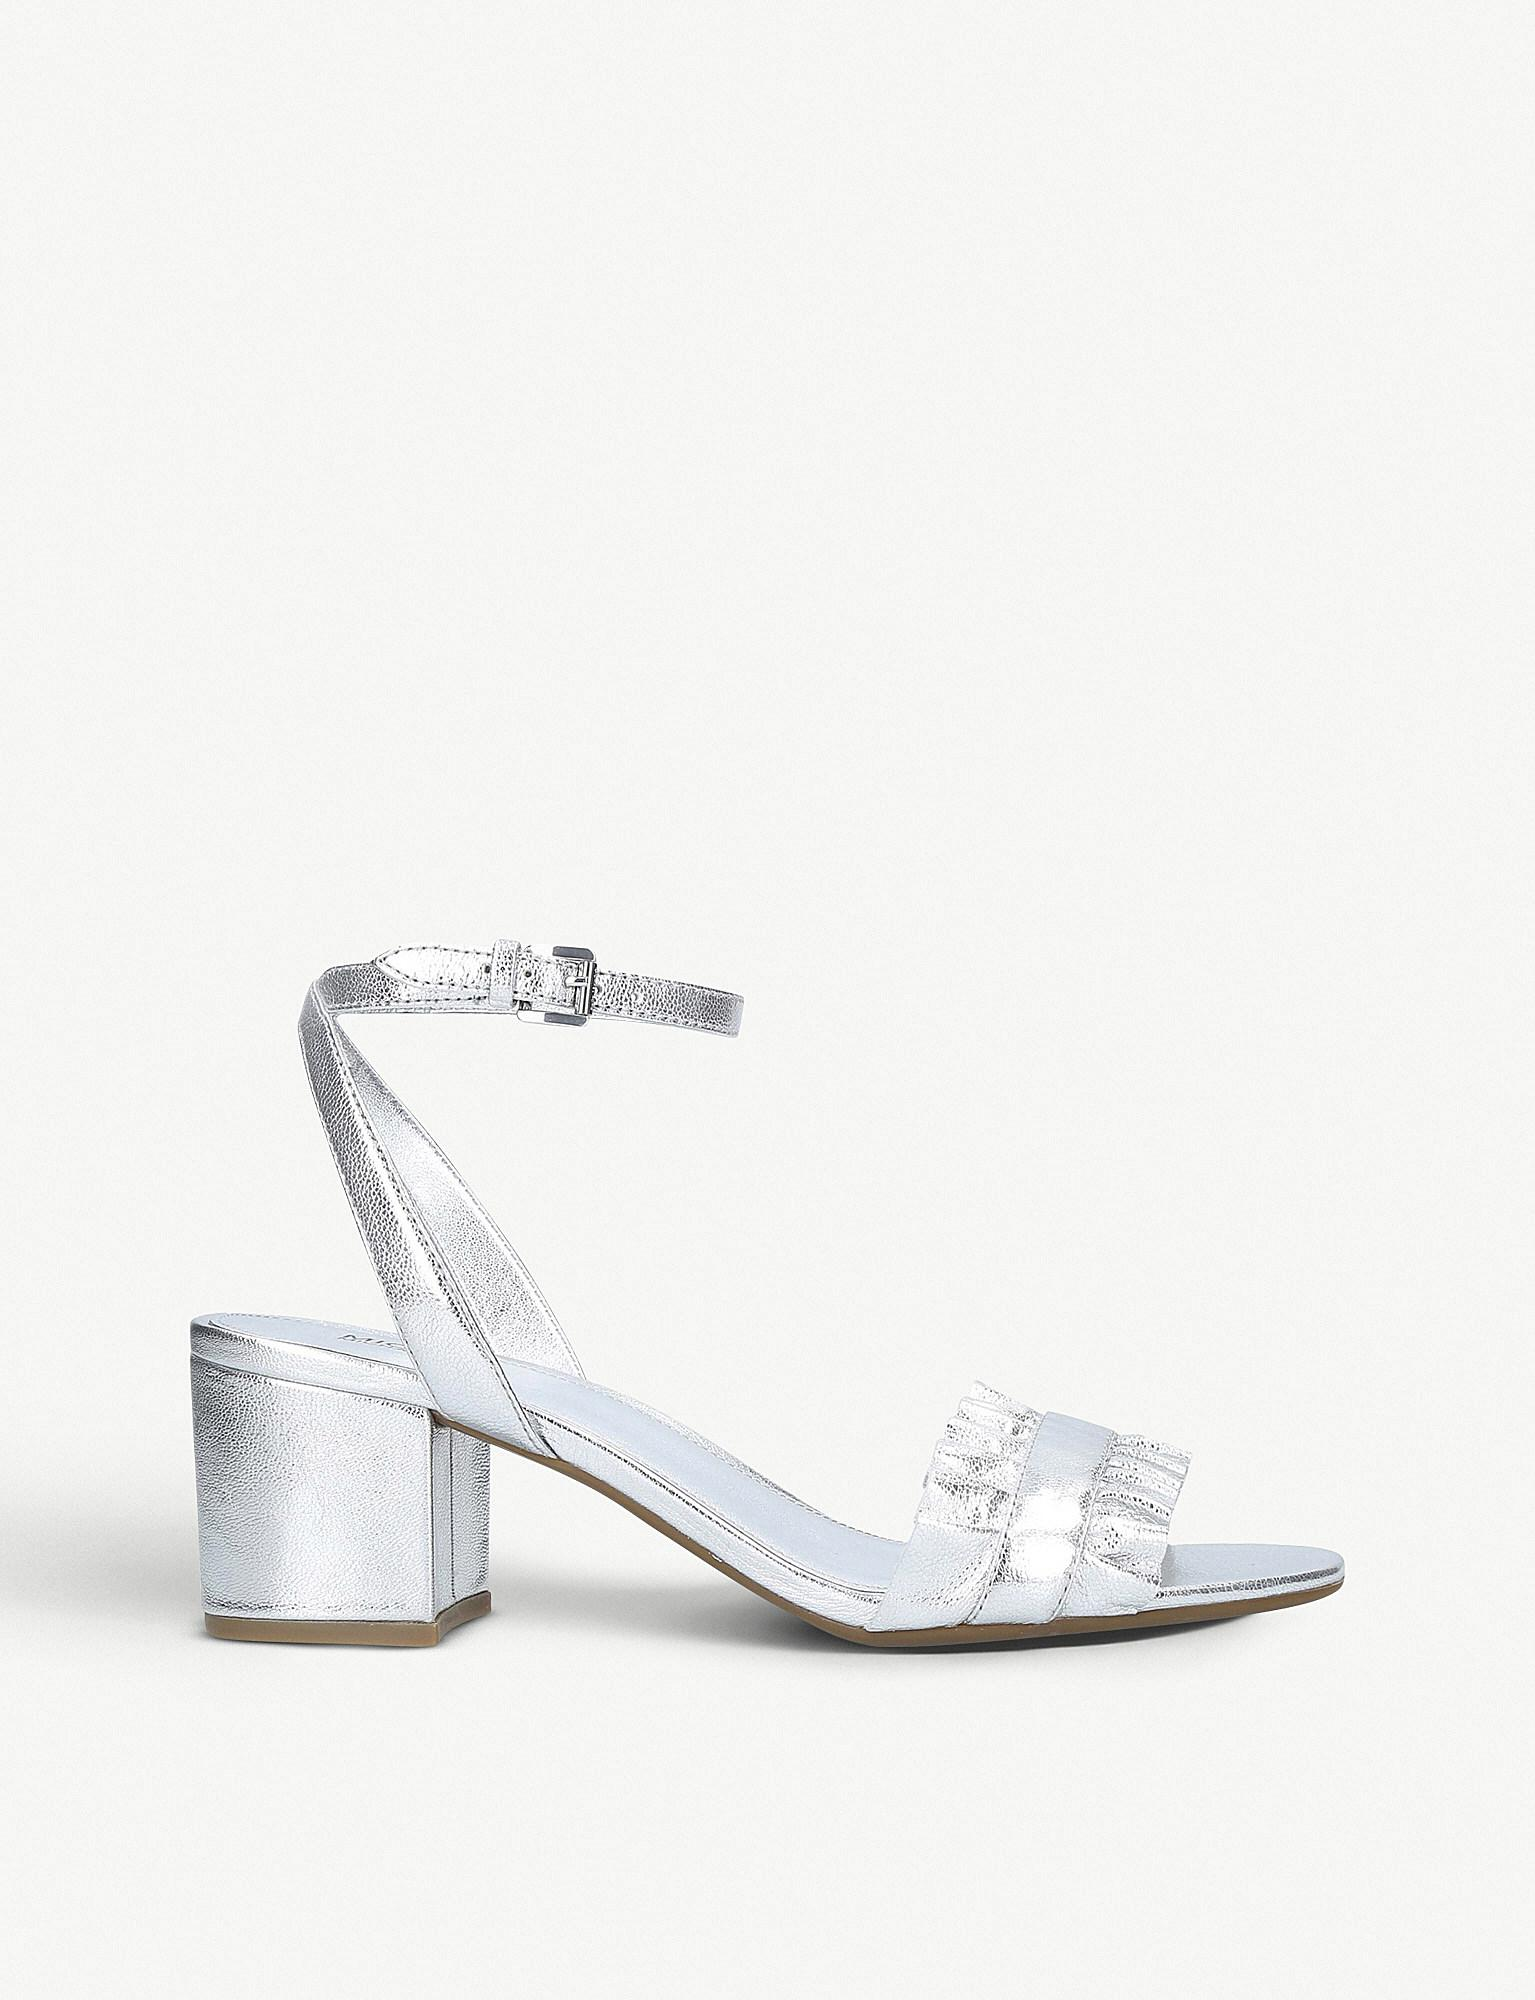 c8df3e150b7 Lyst - MICHAEL Michael Kors Bella Flex Leather Block-heel Sandals in ...